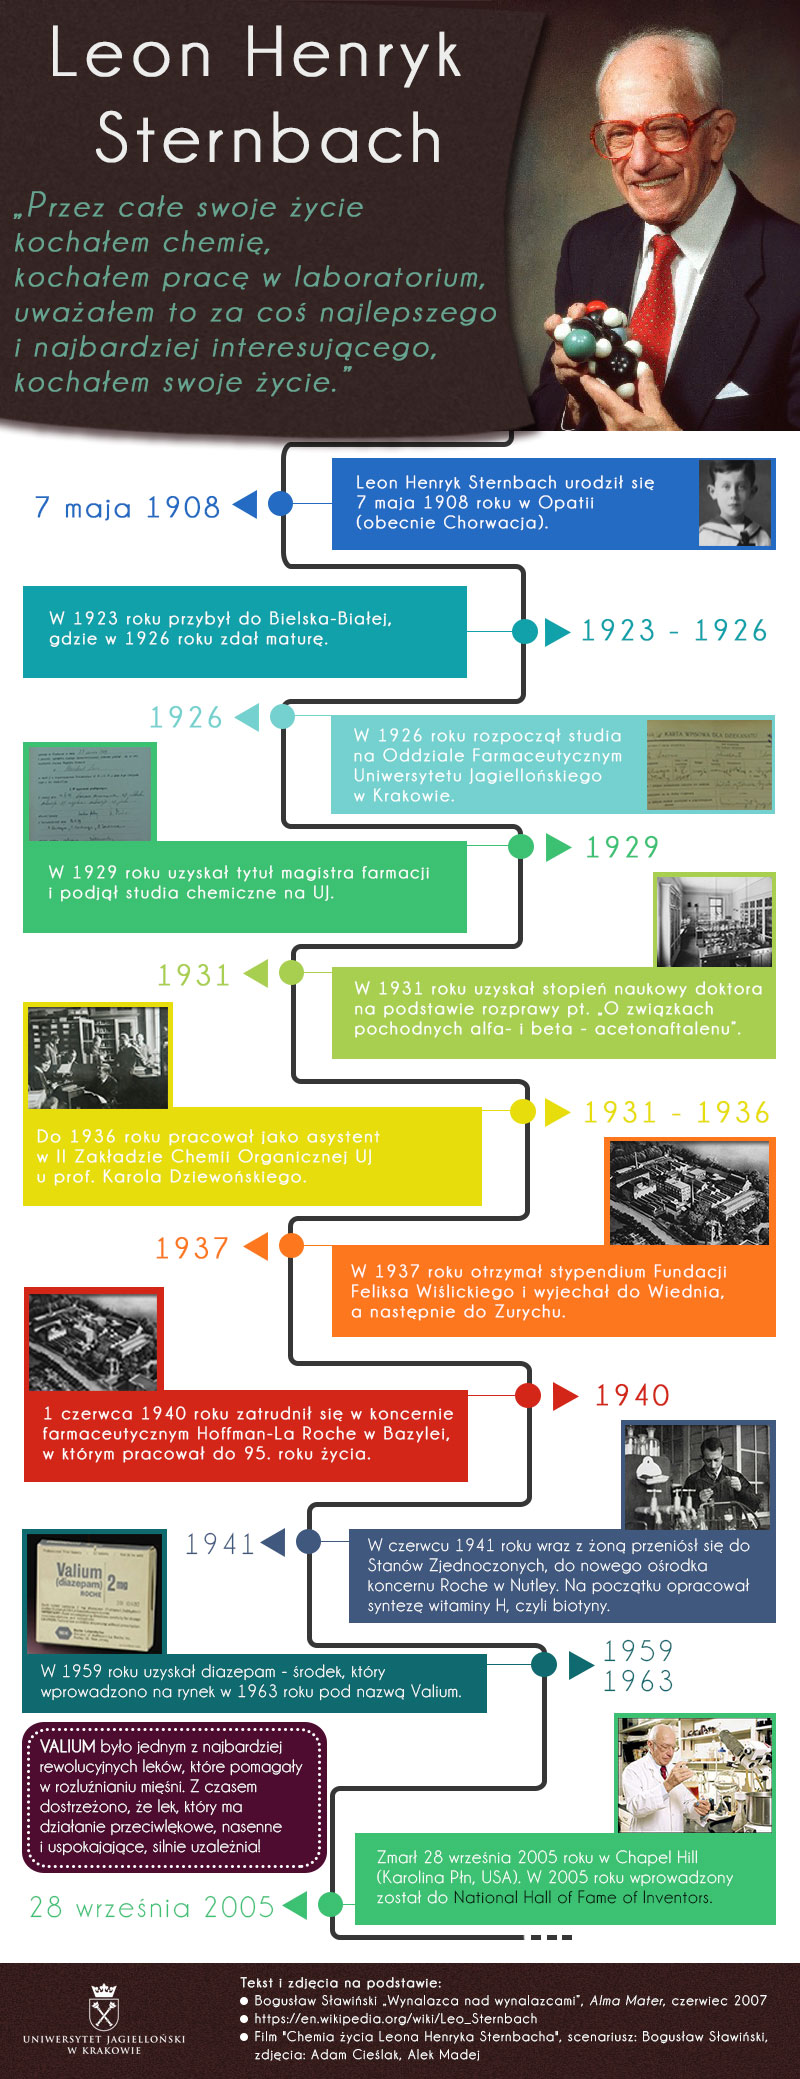 Leon Sternbach - infografika